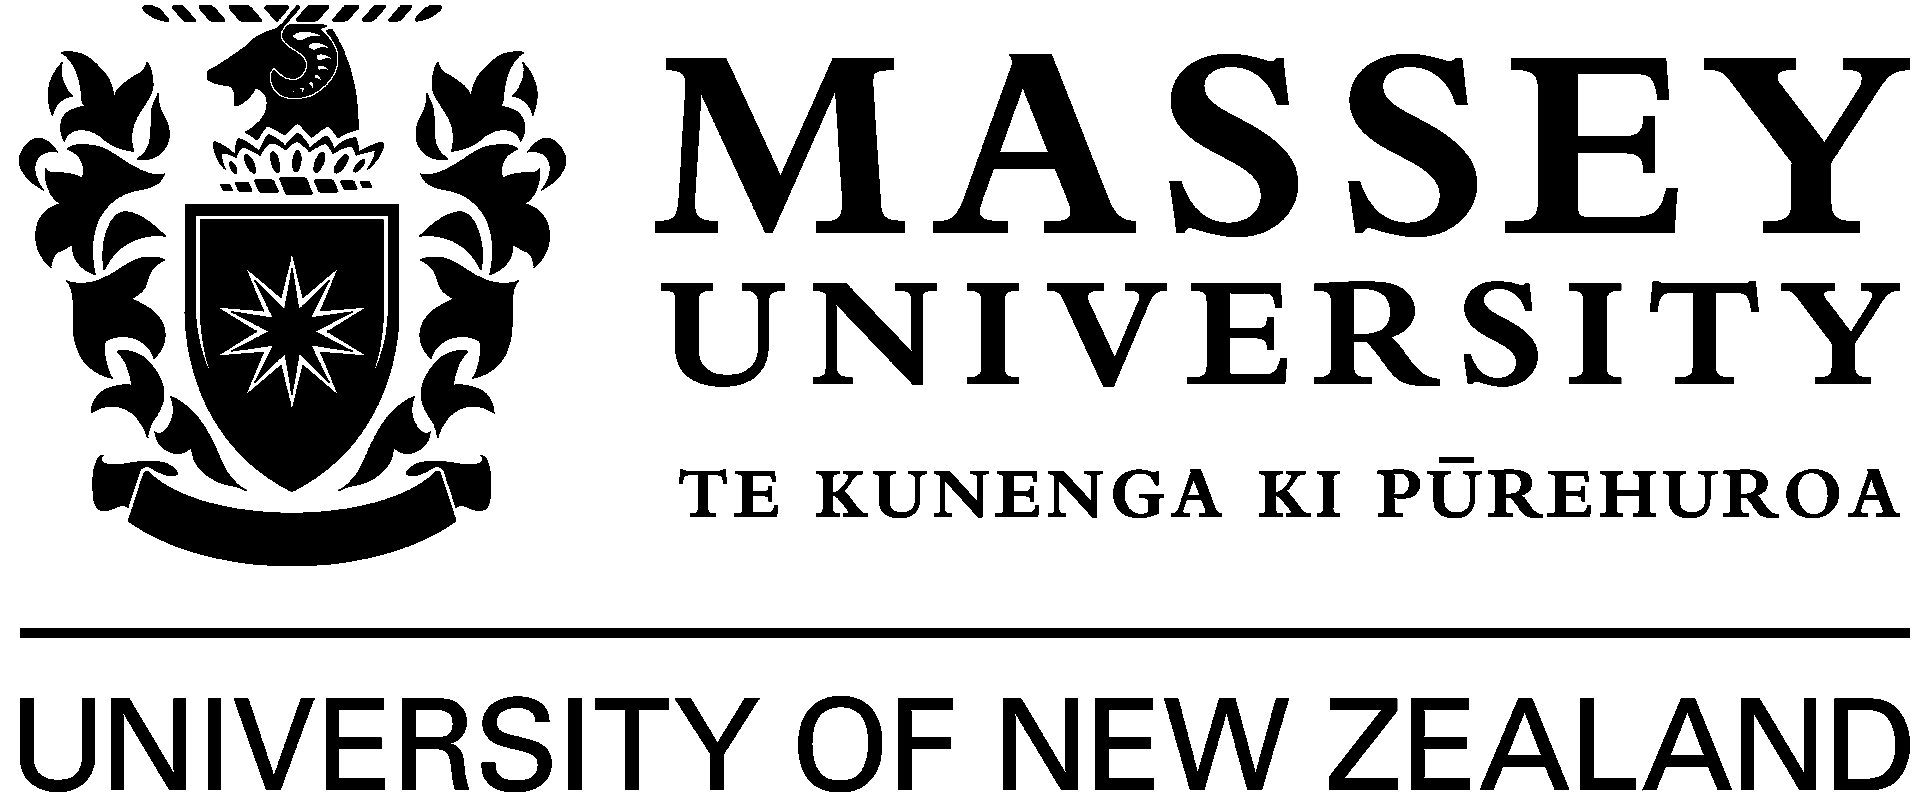 Massey-University_black.png